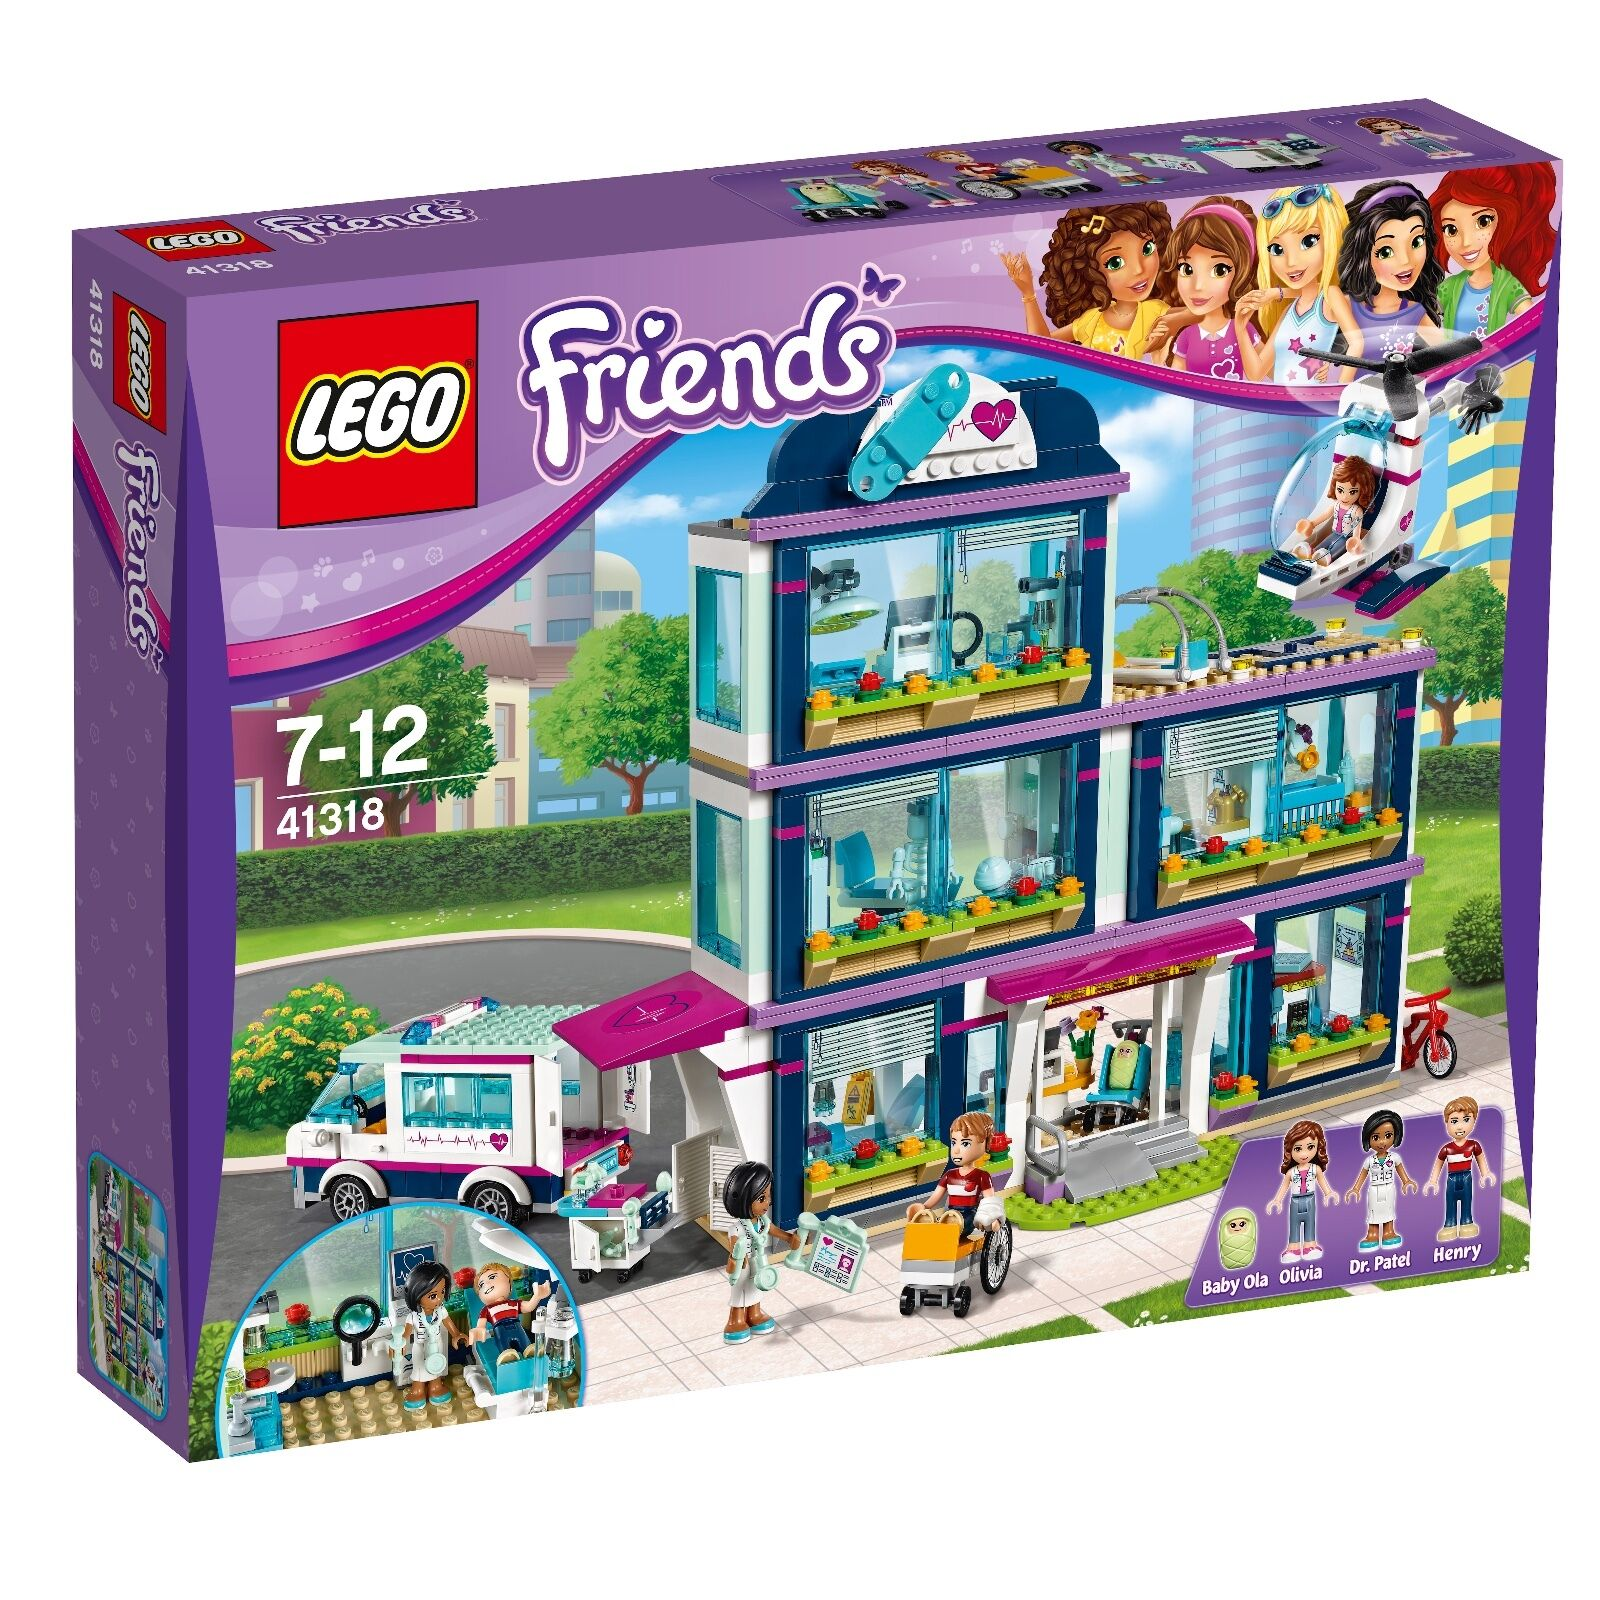 LEGO ® Friends 41318 Heartlake hôpital Nouveau neuf dans sa boîte _ Heartlake Hospital new Boîte d'origine jamais ouverte